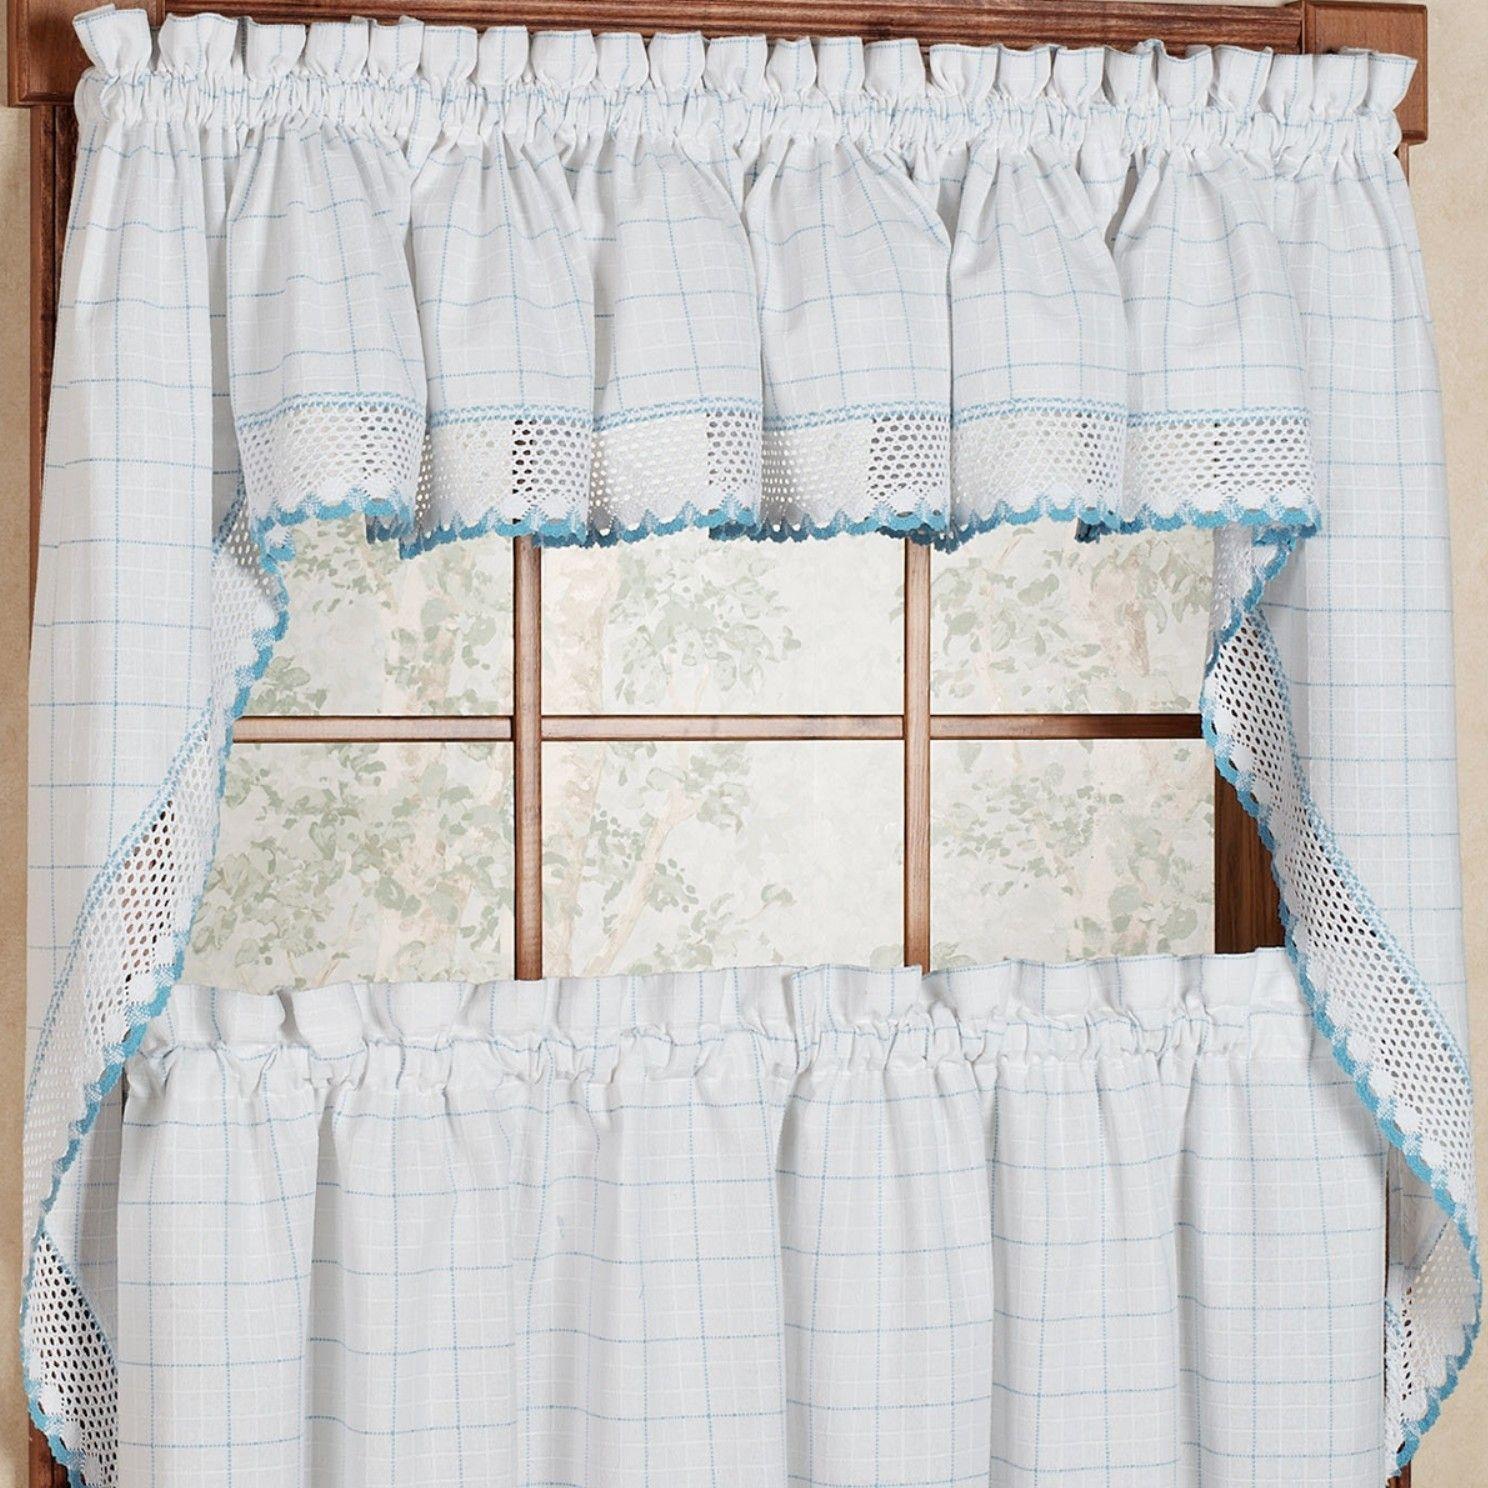 "Adirondack 38"" Cotton Kitchen Window Swag Curtain Valance Regarding Classic Kitchen Curtain Sets (View 2 of 20)"